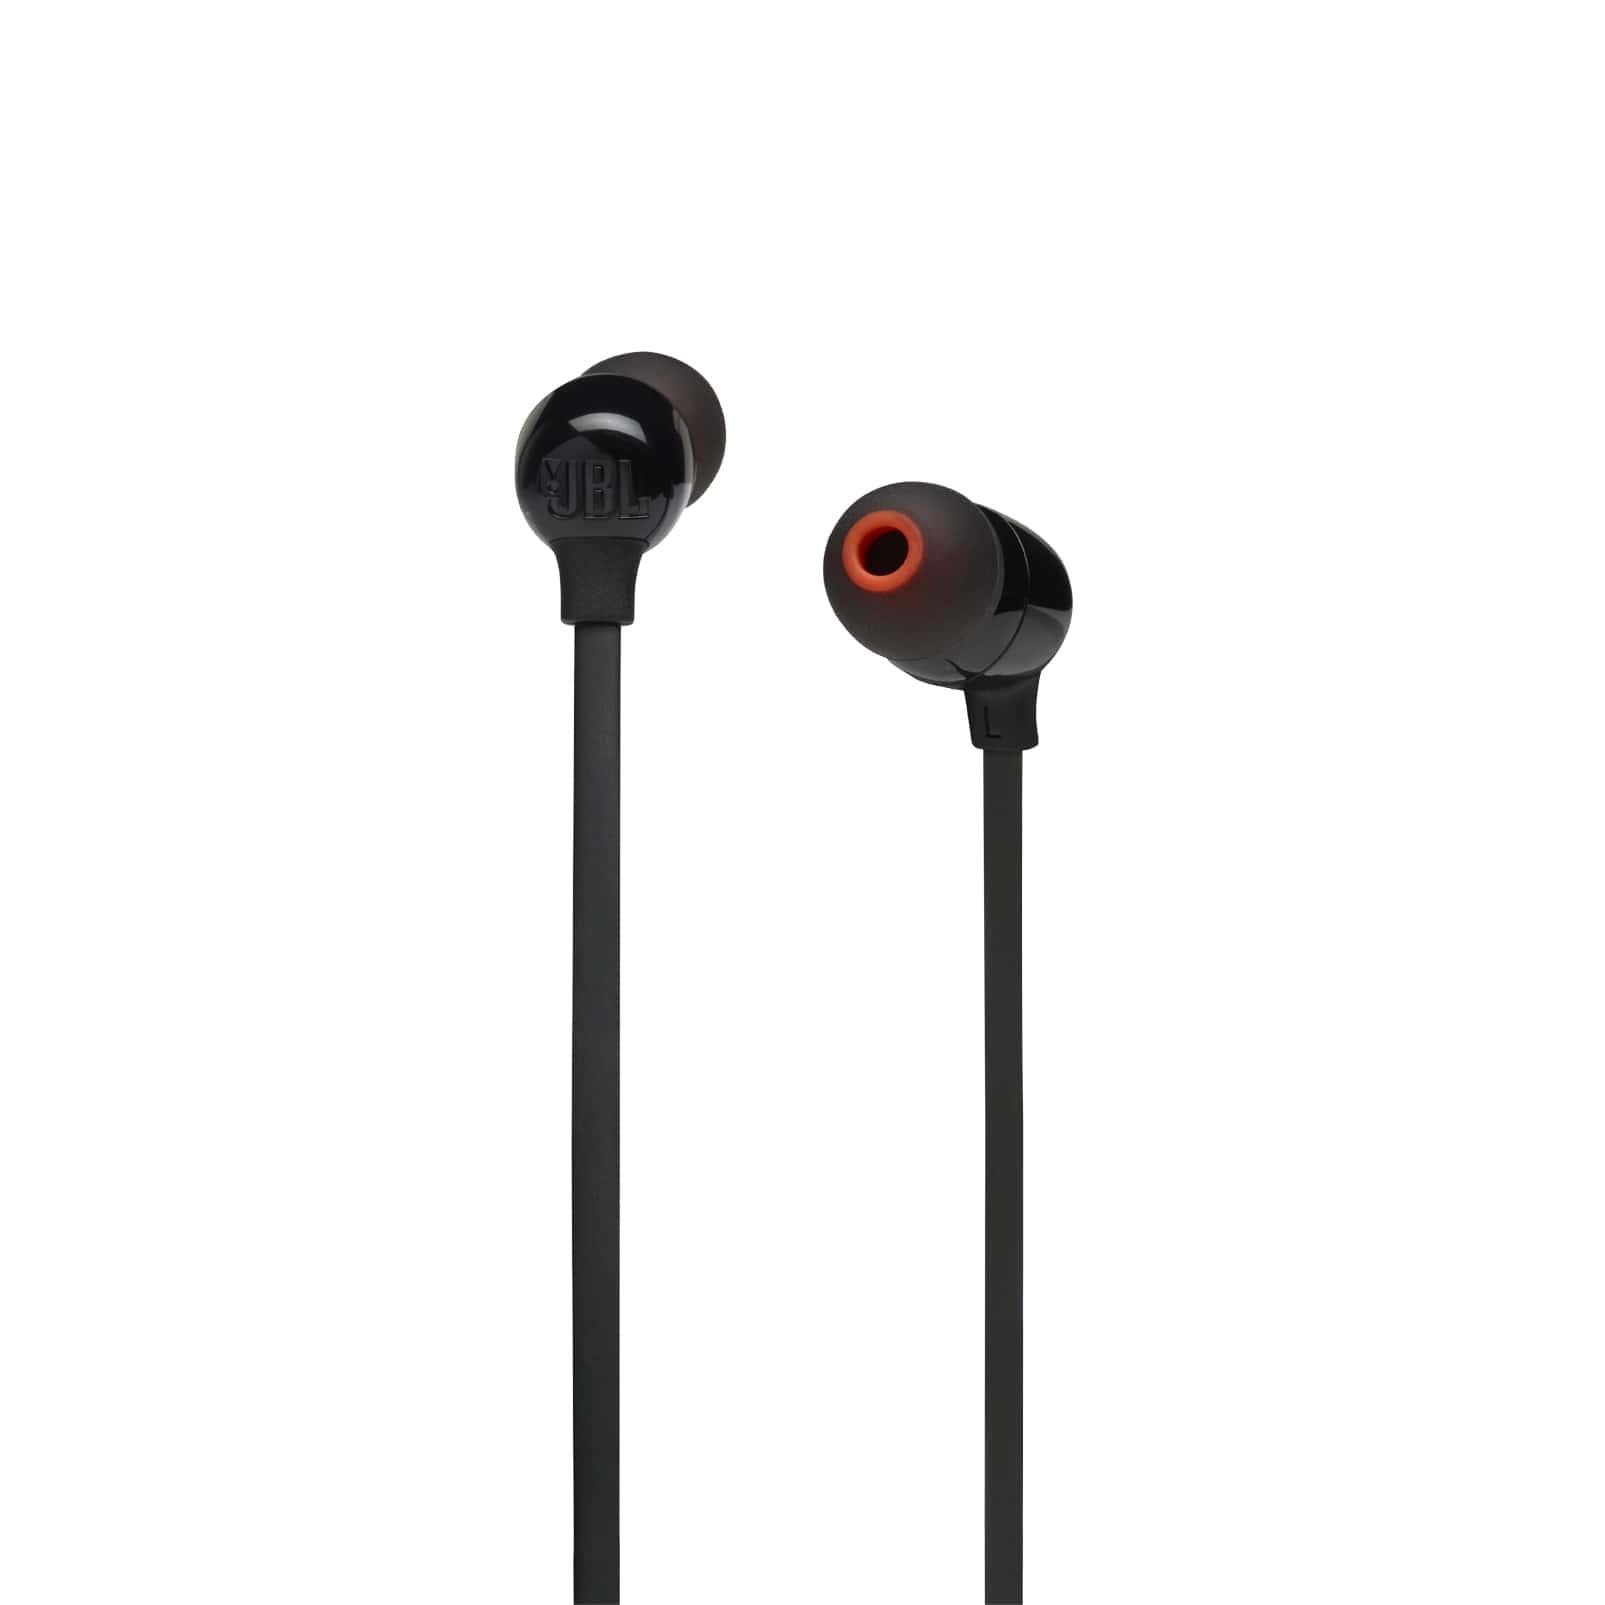 Fone de Ouvido JBL Tune 125BT Preto Bluetooth 5.0 Multiponto Wireless Pure Bass Sound JBLT125BTBLK